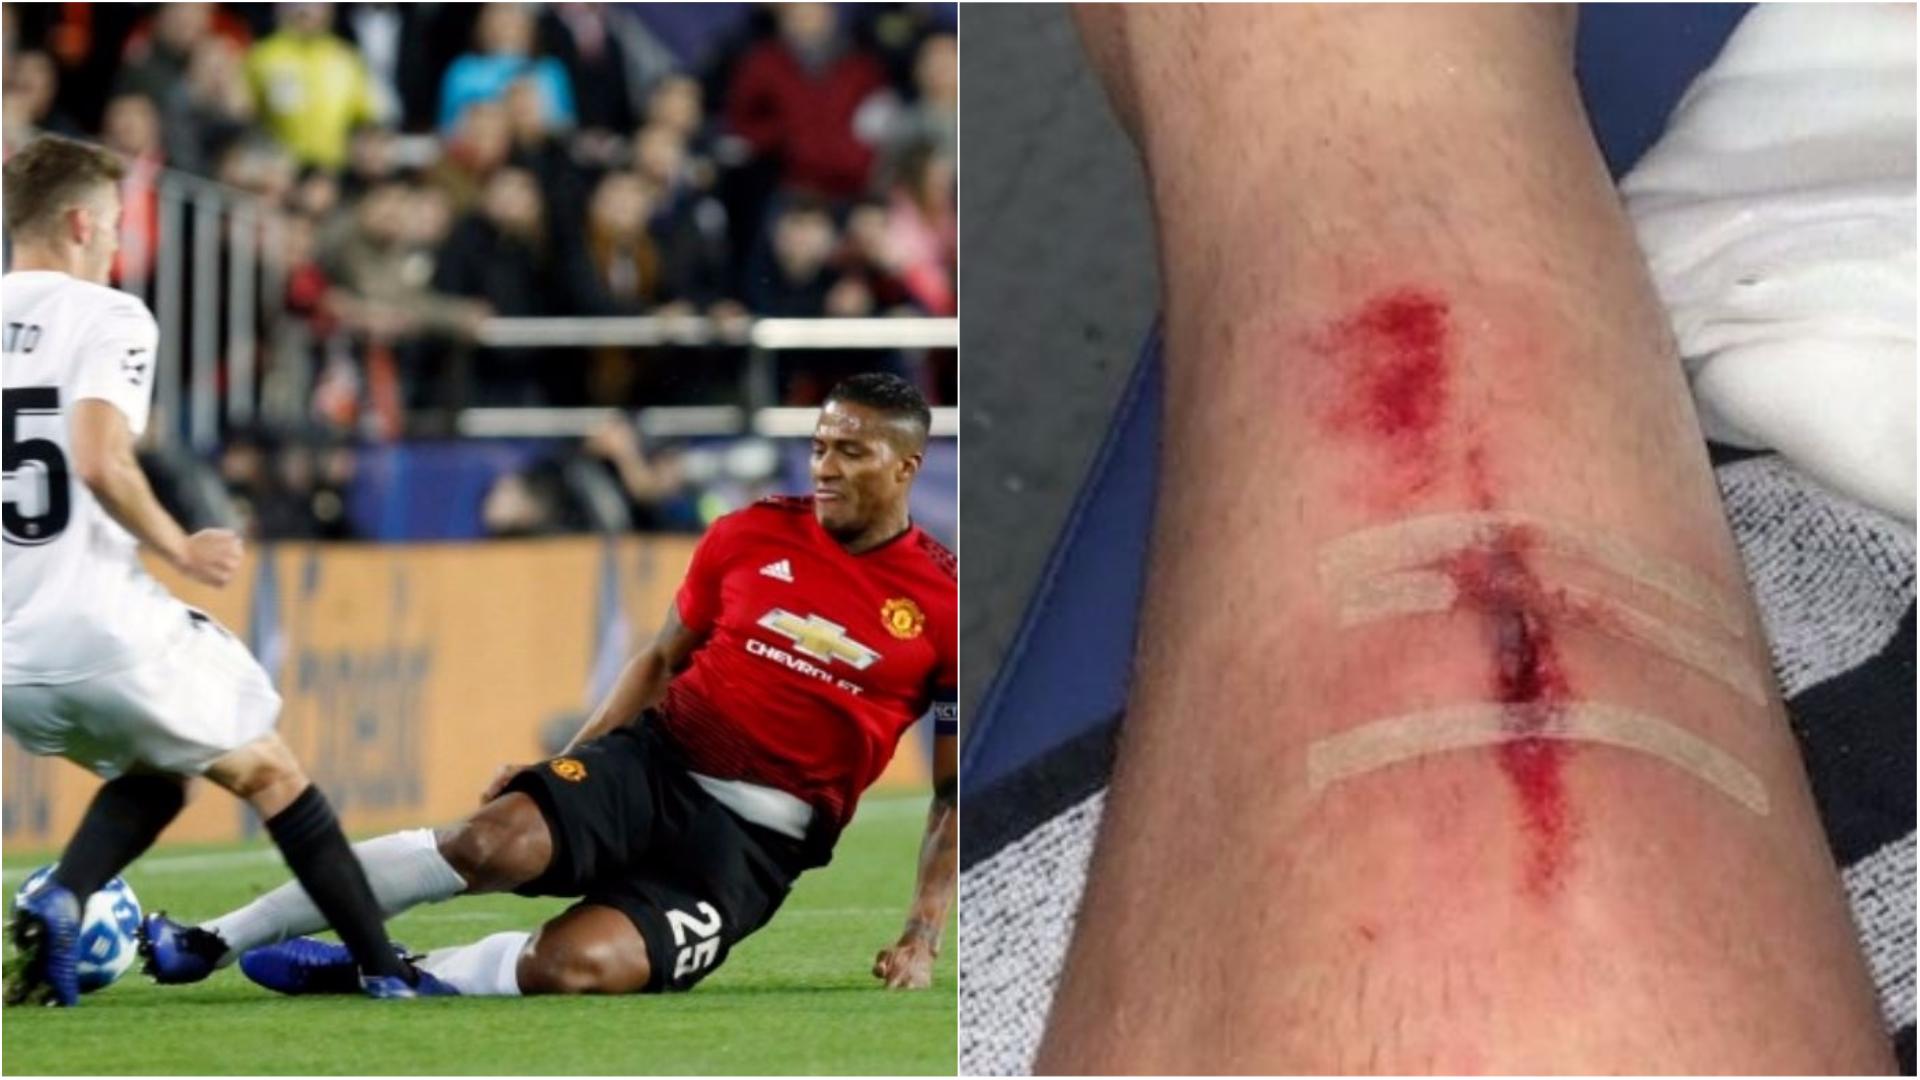 Toni Lato reveals nasty injury from Antonio Valencia's horror tackle in Manchester United's defeat to Valencia